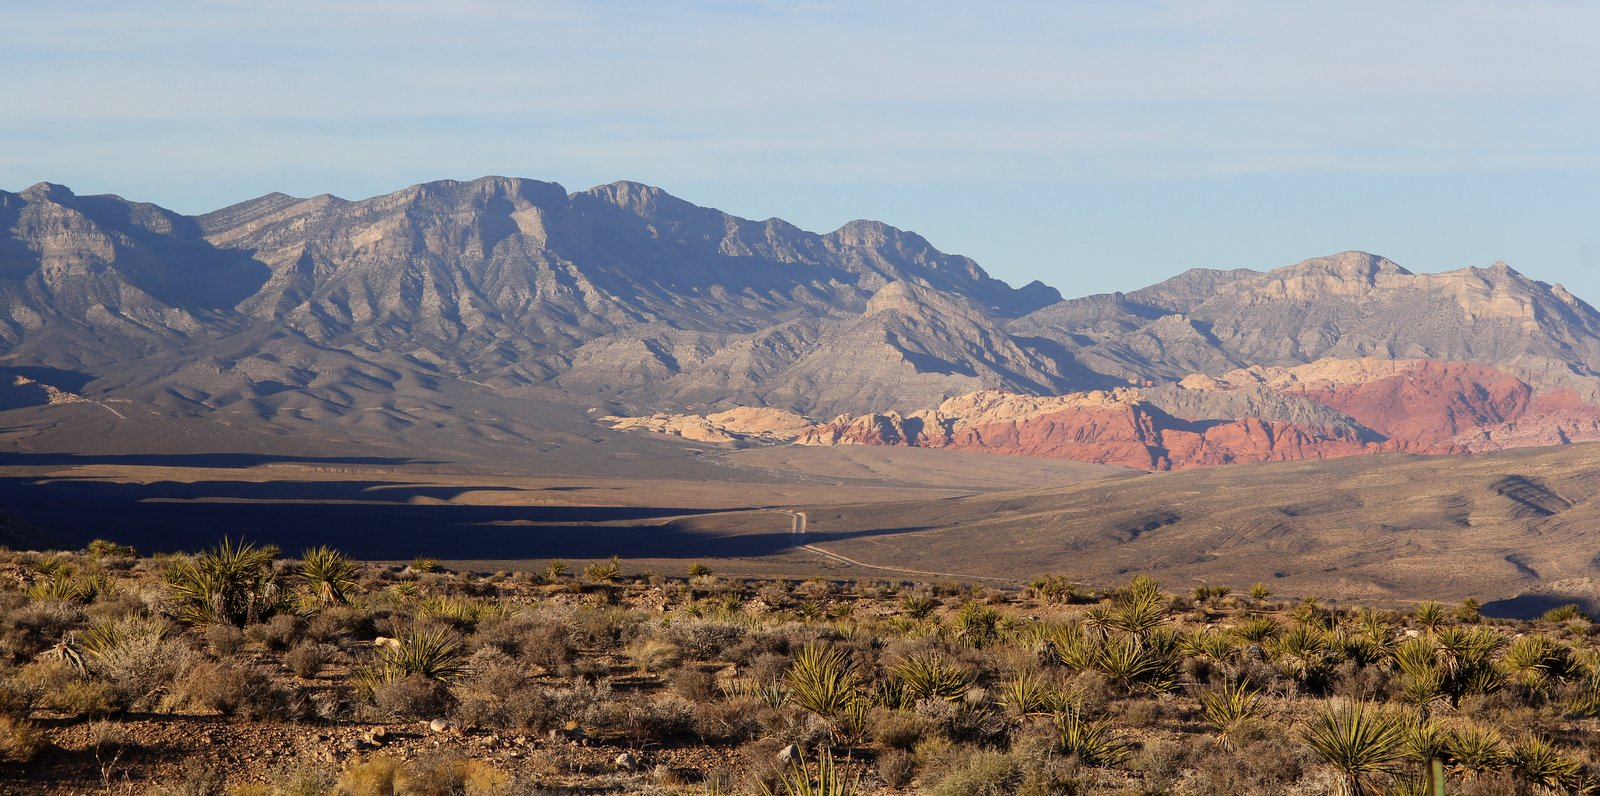 Dolina_Smierci_Death_Valley_Nevada_photo_photo_2398